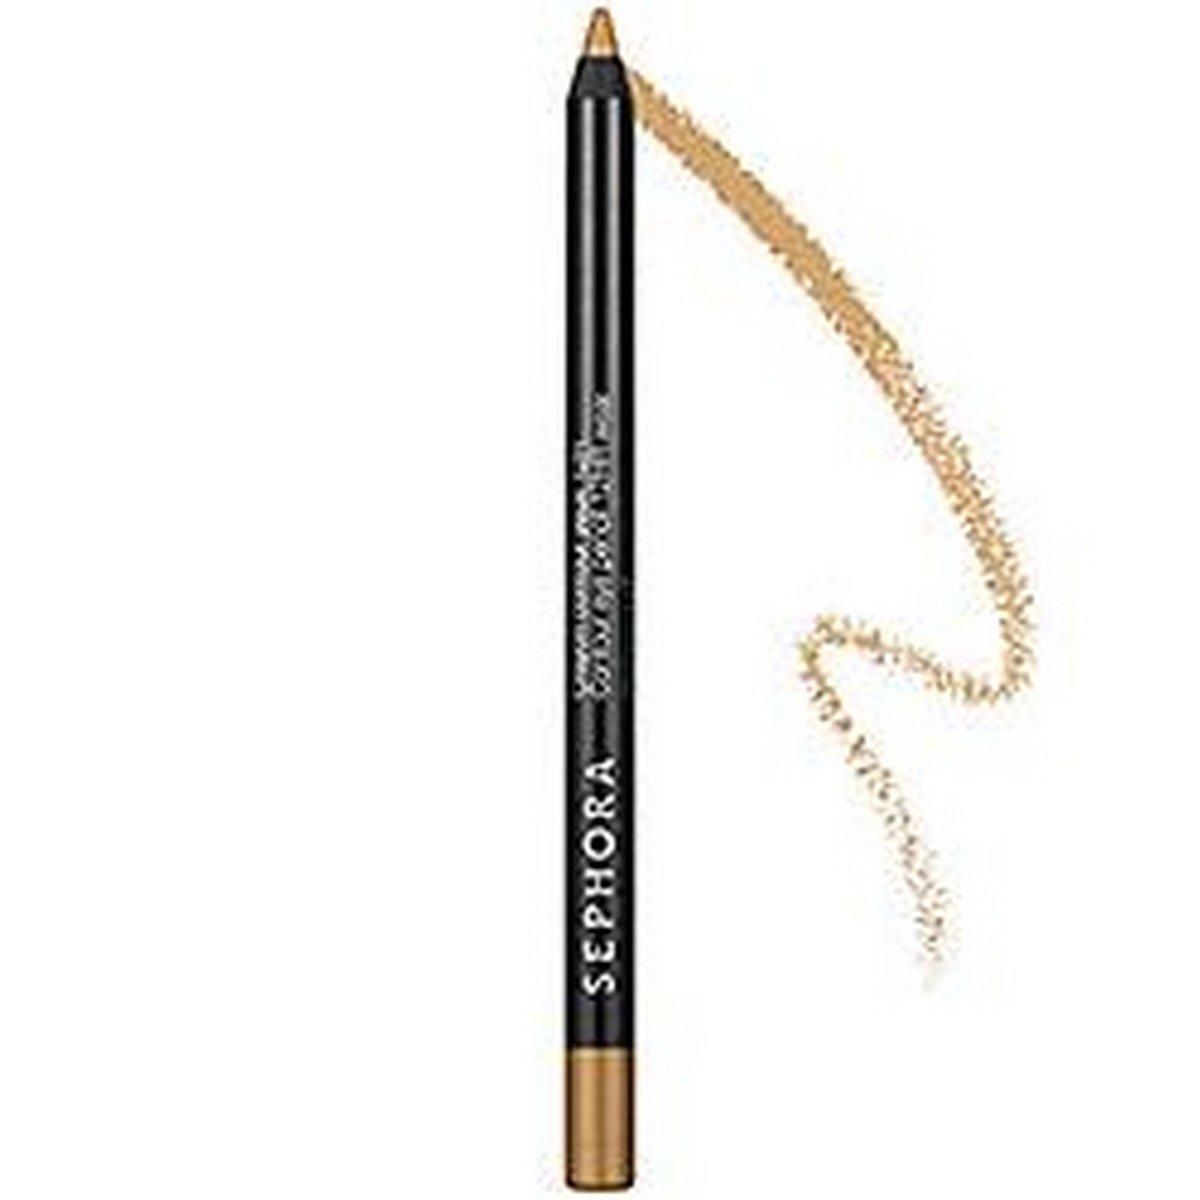 Contour Eye Ranking TOP5 Pencil 12hr Wear Waterproof Great interest 0.04 Sephora Ni Girls Oz